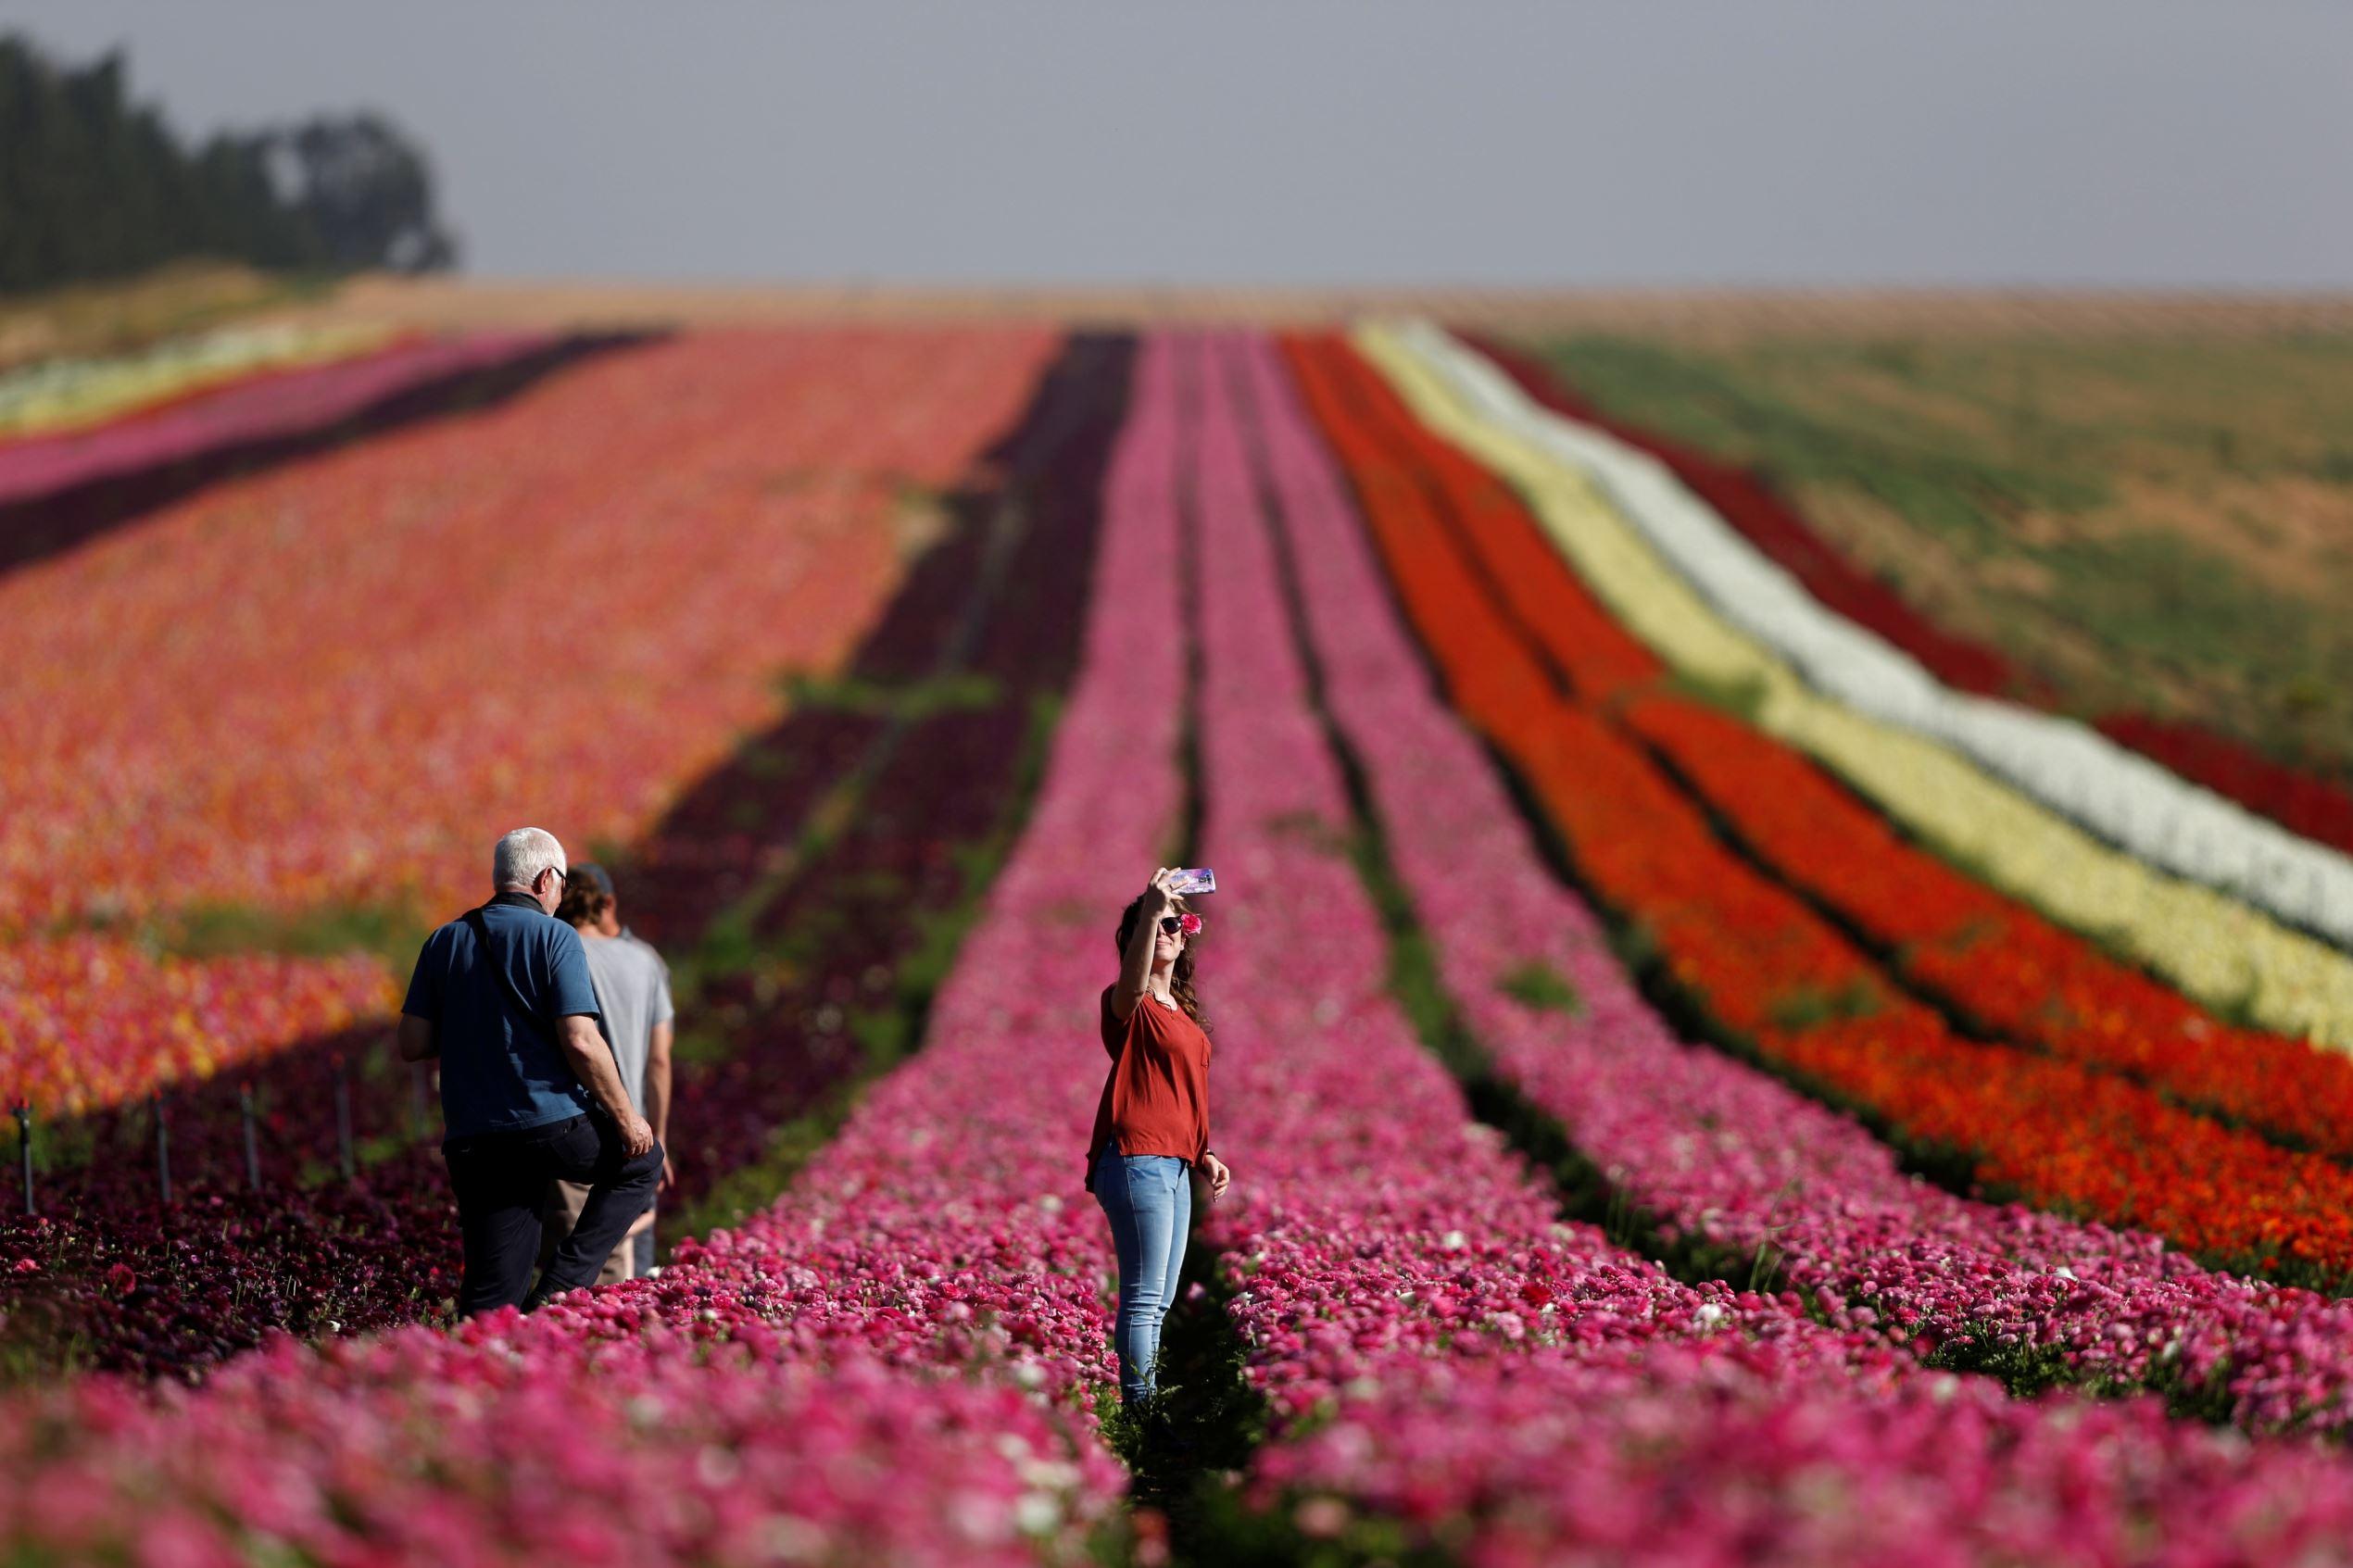 Слайд 40 из 86: An Israeli woman takes a selfie in a buttercup field near Kibbutz Nir Yitzhak in southern Israel, just outside the Gaza Strip April 18, 2016. REUTERS/Amir Cohen TPX IMAGES OF THE DAY